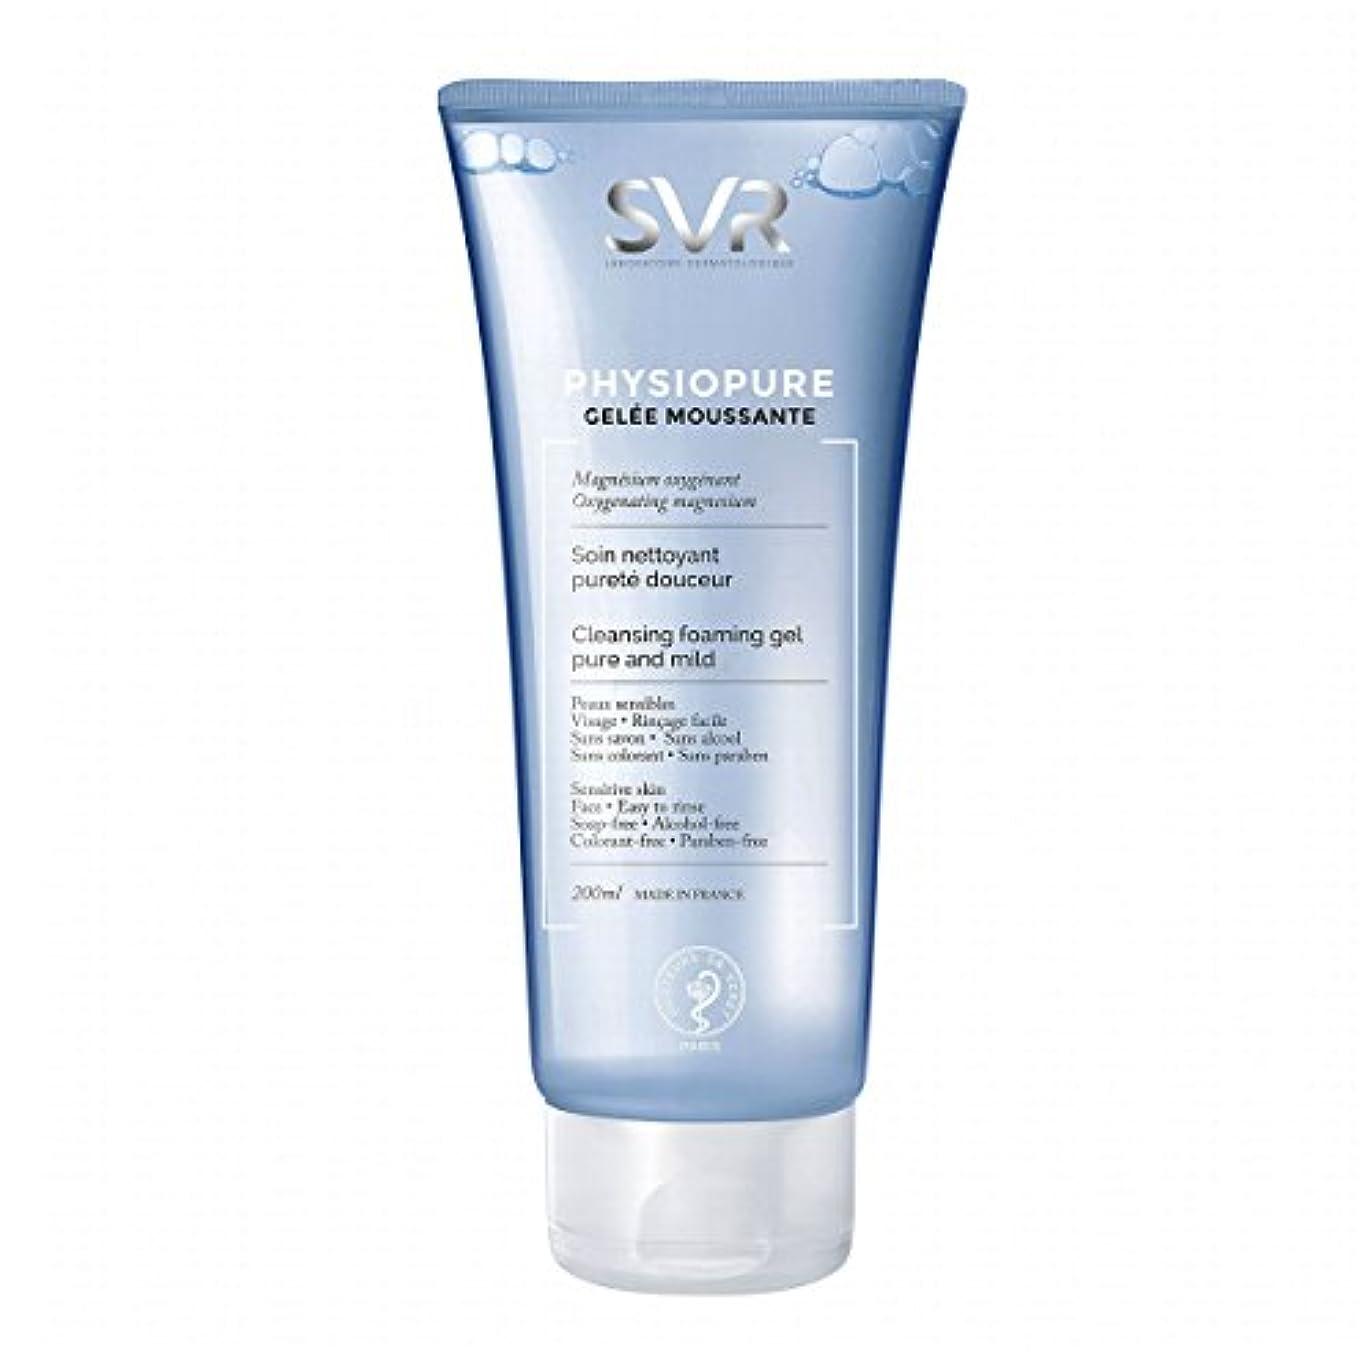 Svr Physiopure Cleansing Foaming Gel 200ml [並行輸入品]